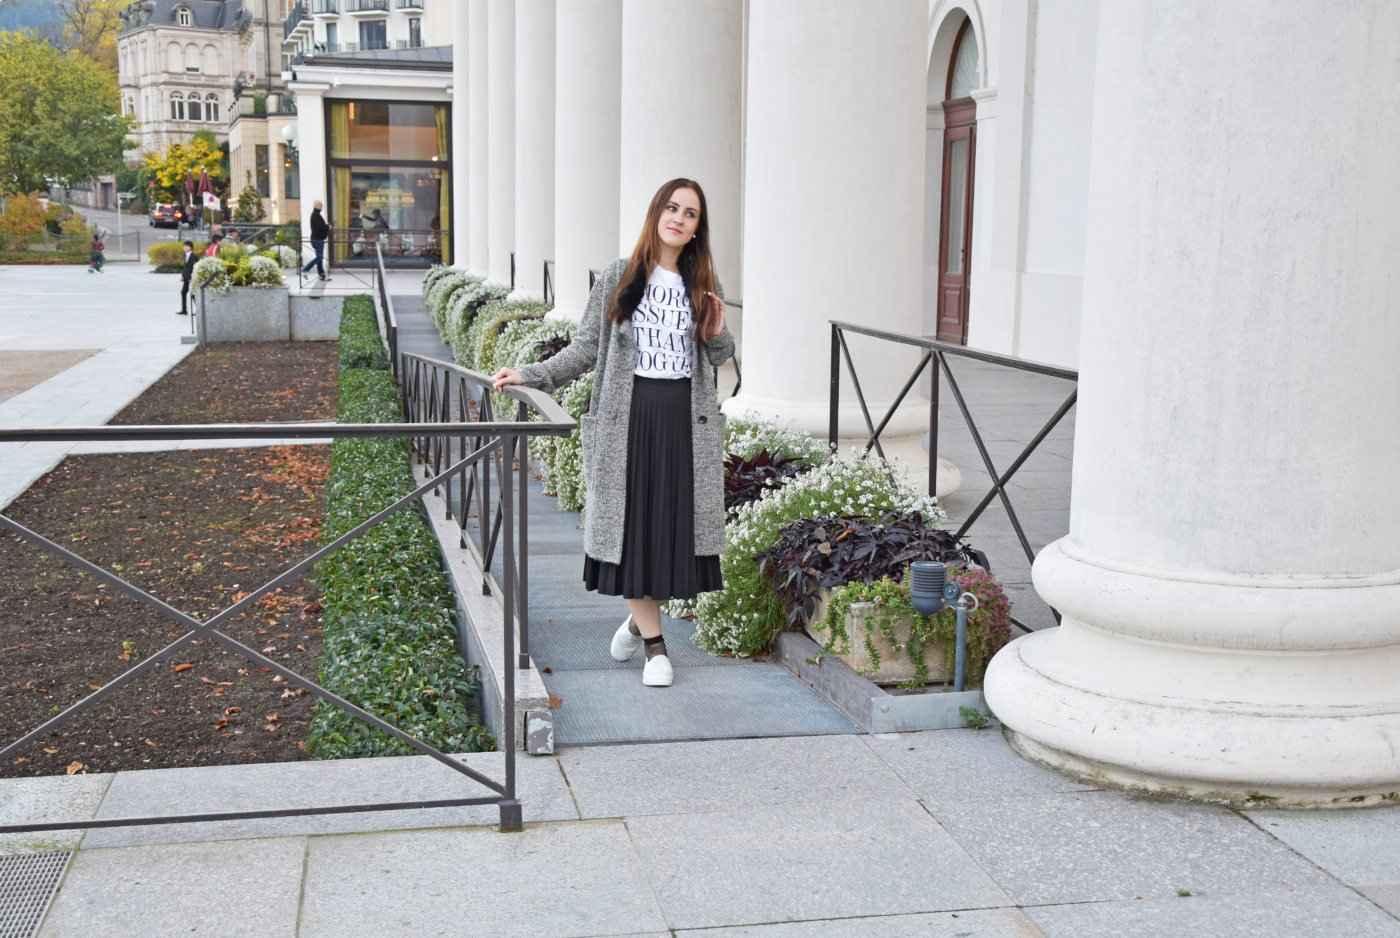 Skechers Midi Skirt Fishnet Look Fashion Fashionblogger Outfit